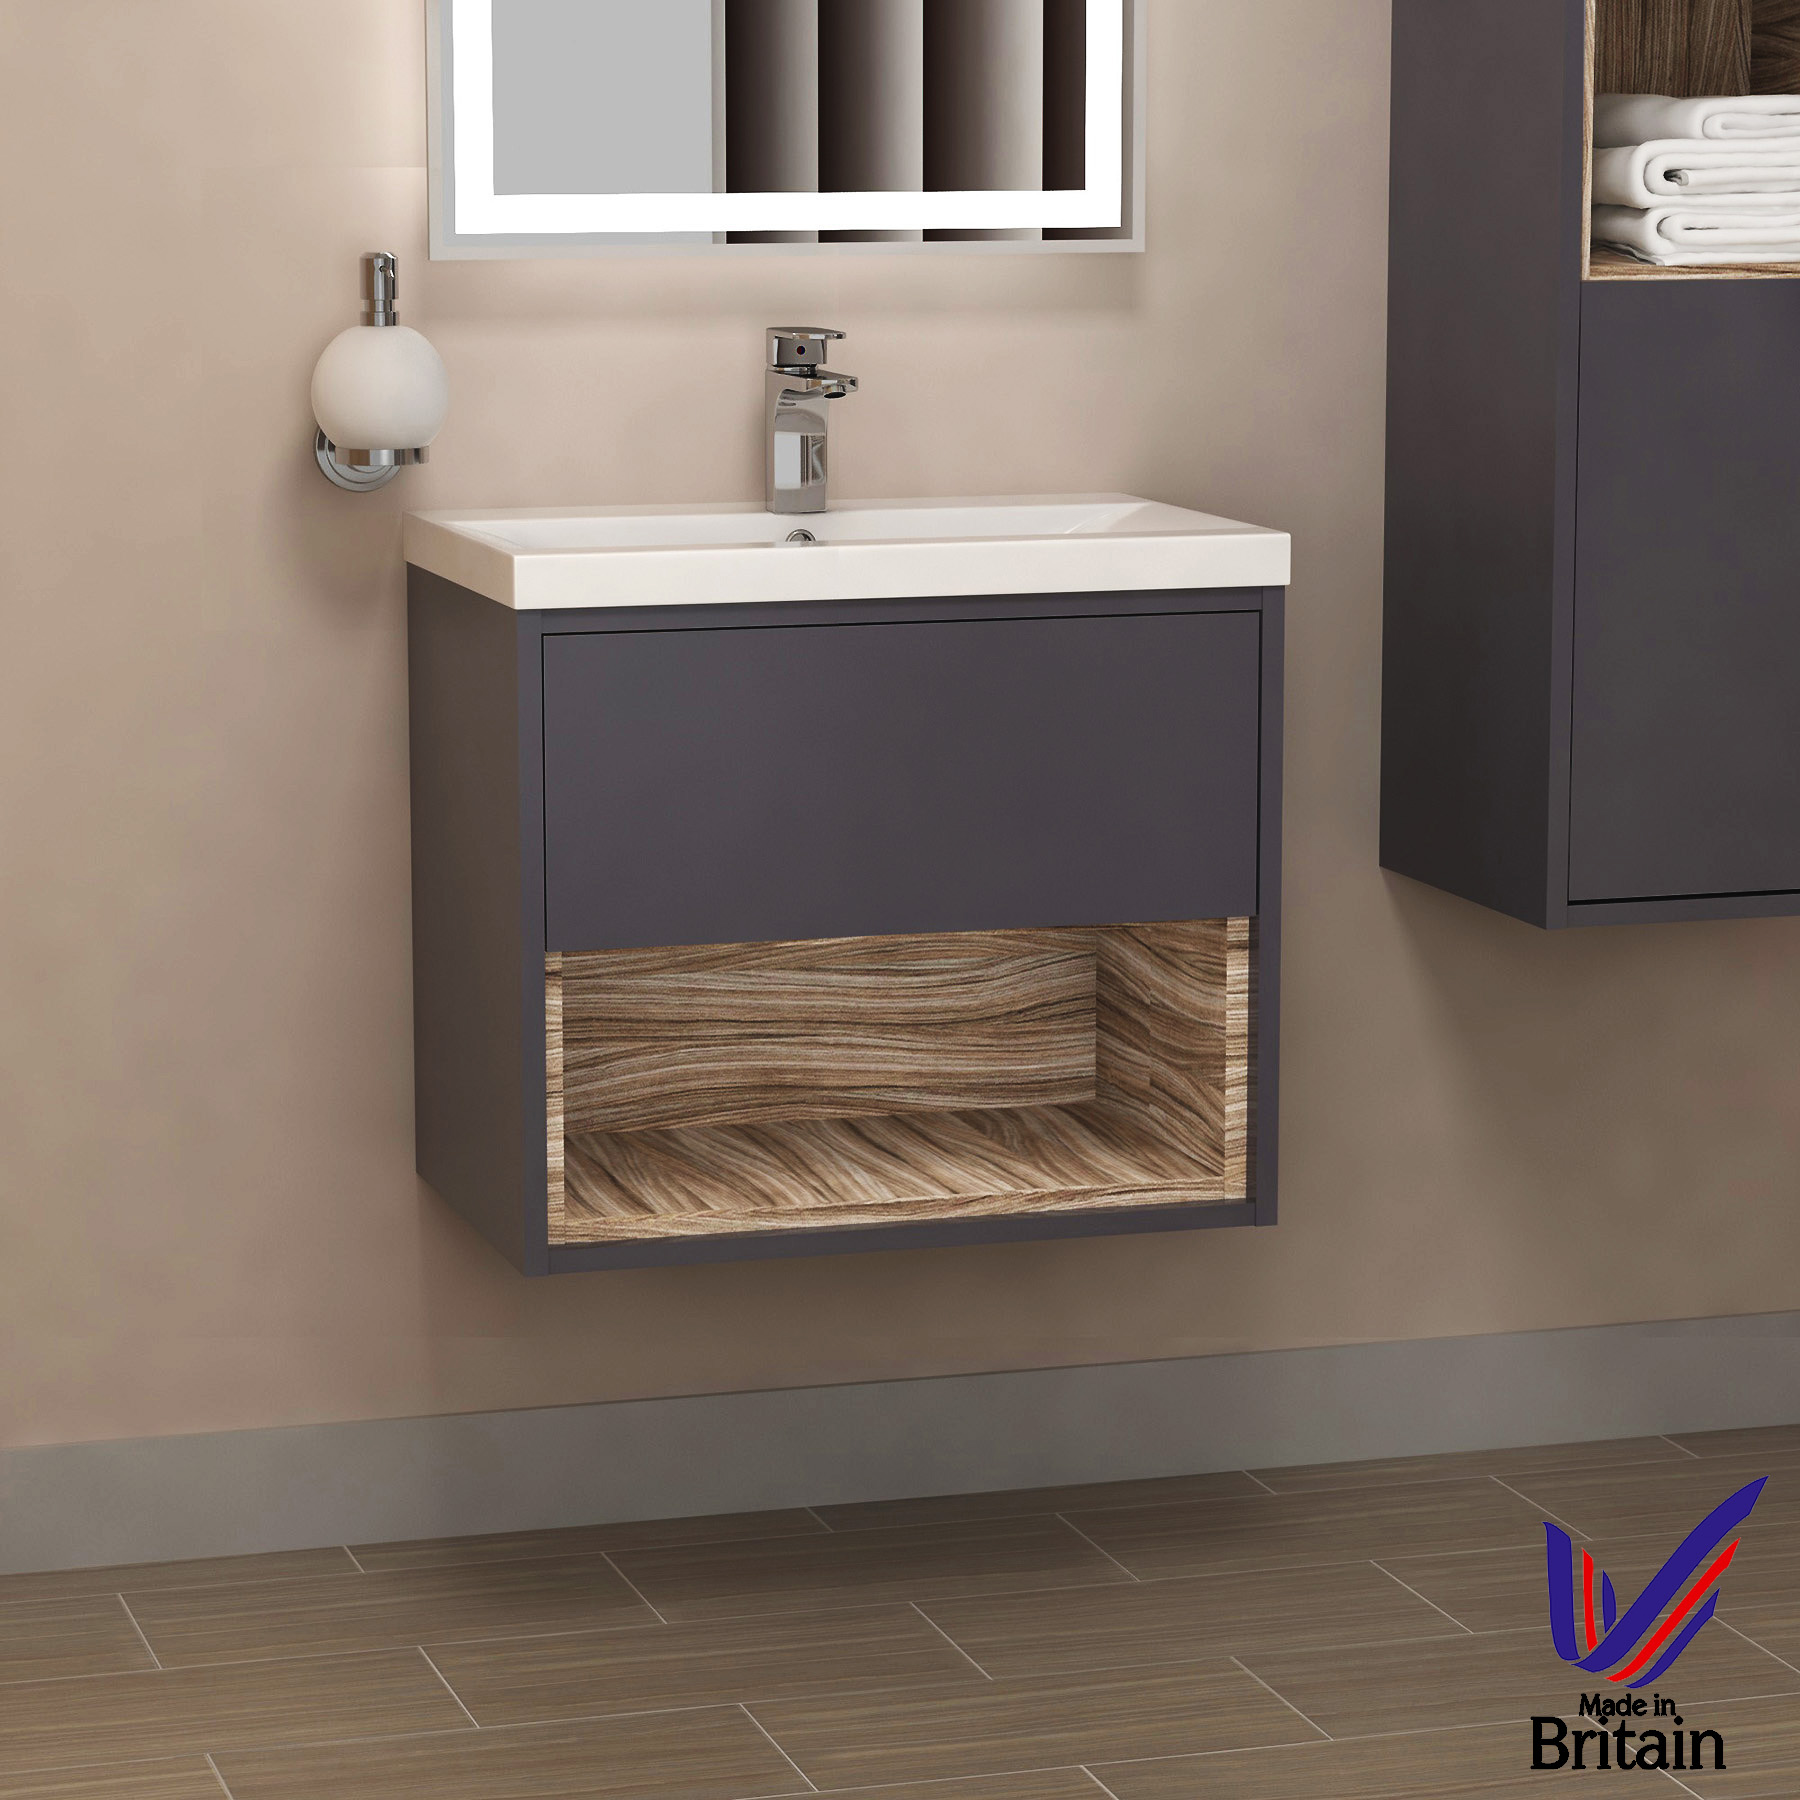 Wall Hung Kitchen Cabinets: 600mm Modern Bathroom Gloss White Wall Hung Vanity Unit